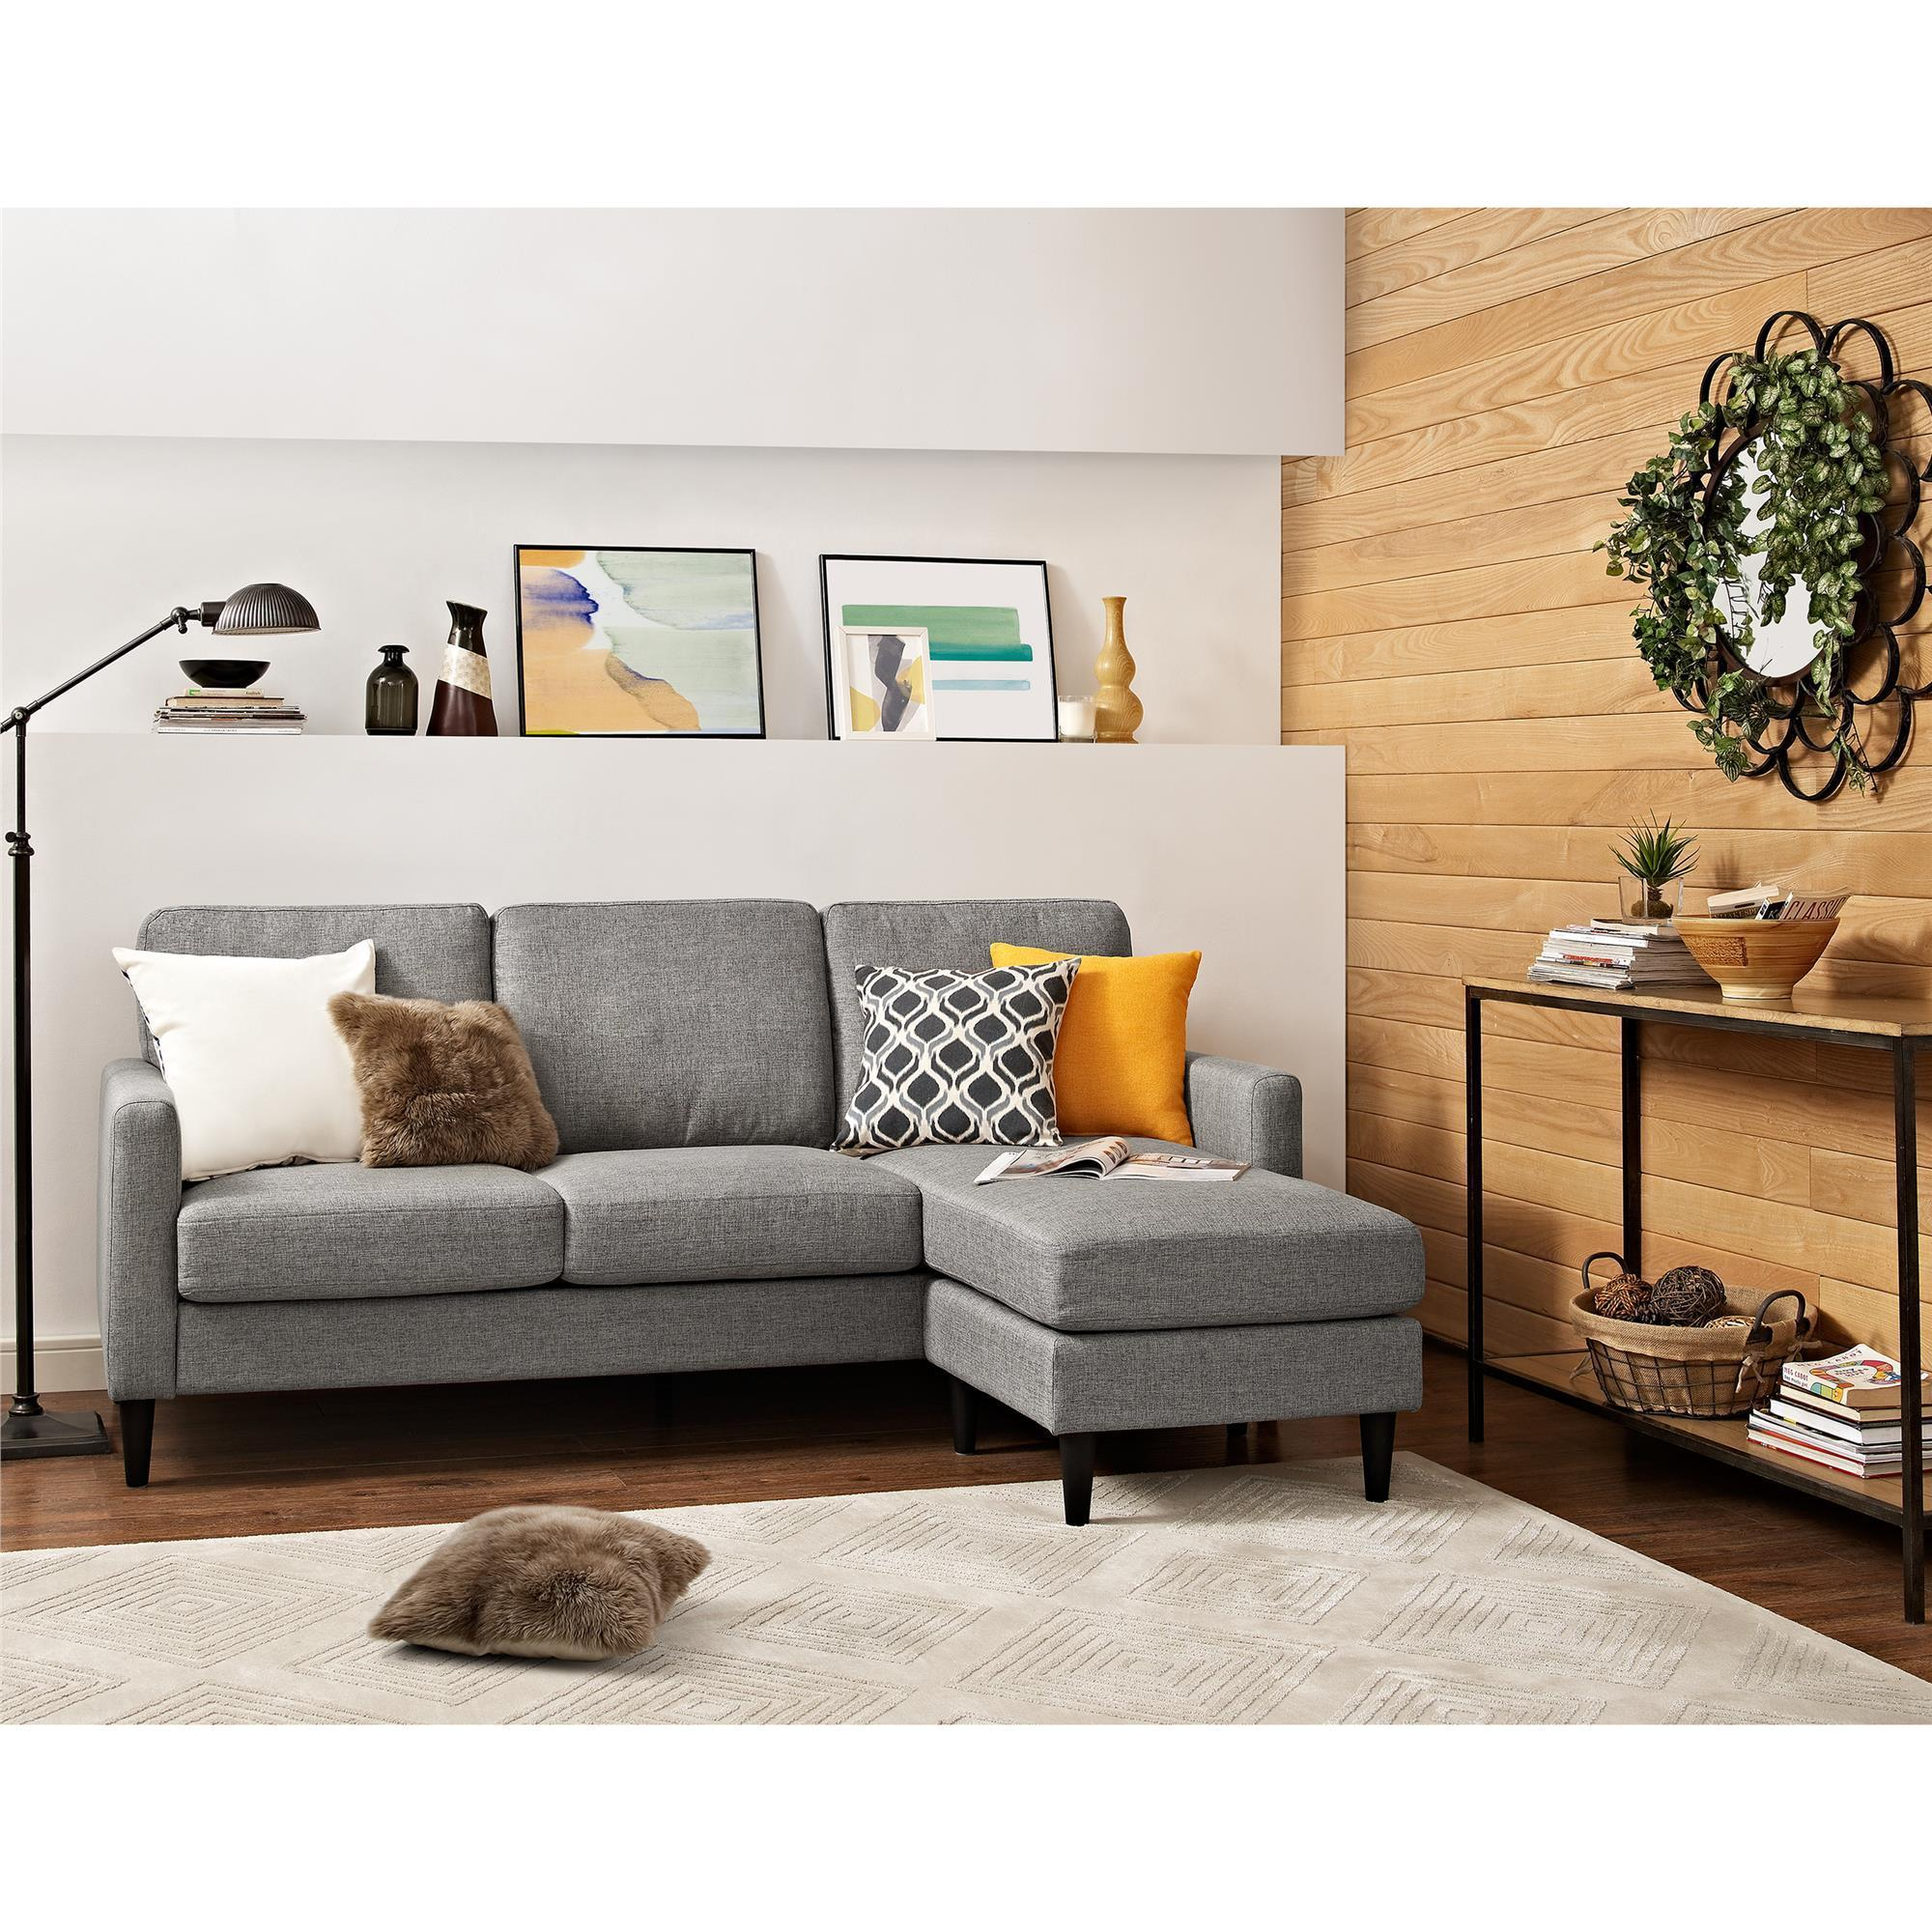 Dorel Living Kaci Grey Sectional Sofa